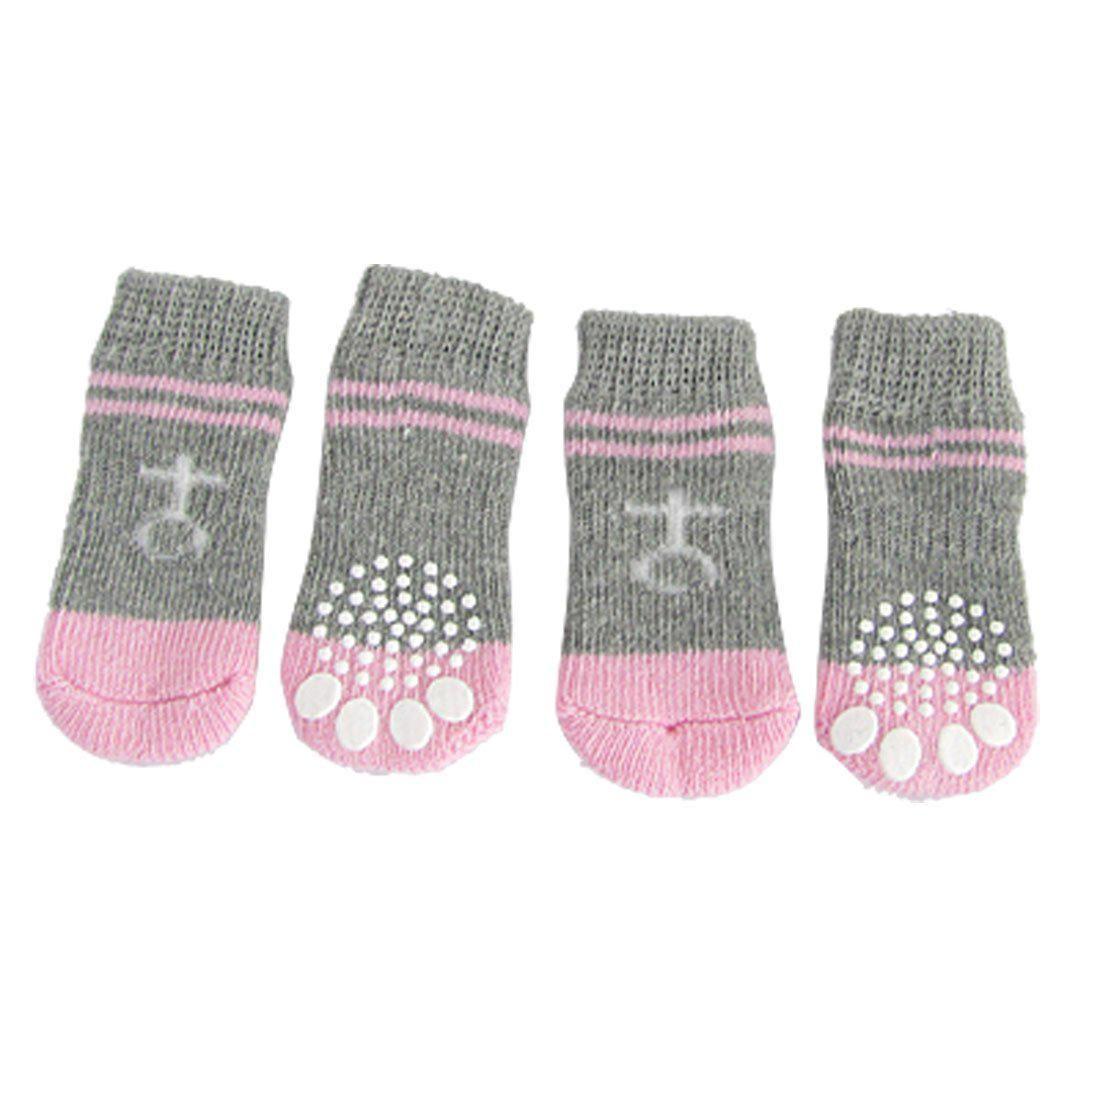 Buy Cheap Socks & Hosiery For Big Save, Wholesale Pink Gray Nonslip ...